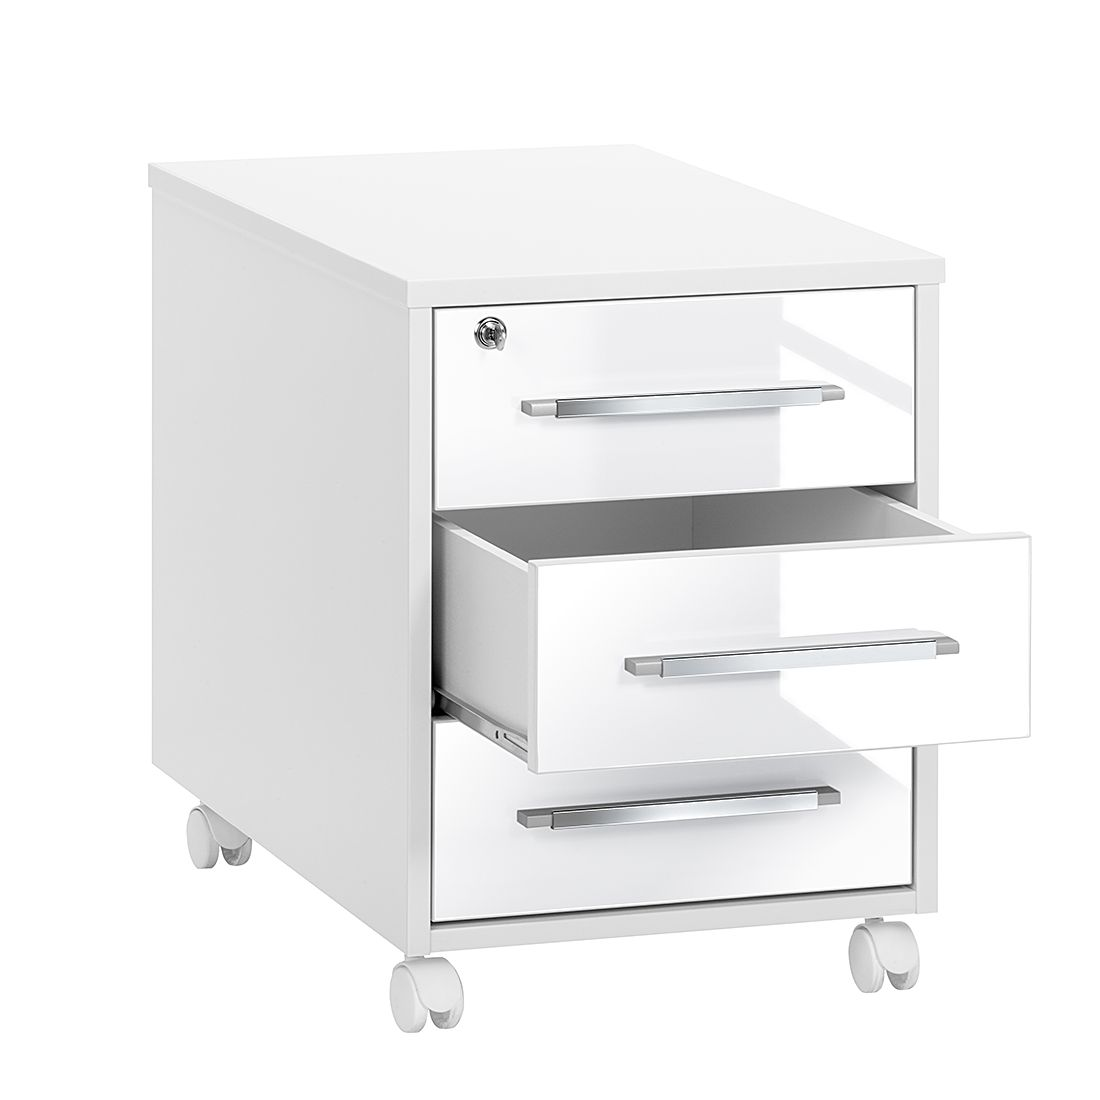 rollcontainer online kaufen m bel suchmaschine. Black Bedroom Furniture Sets. Home Design Ideas